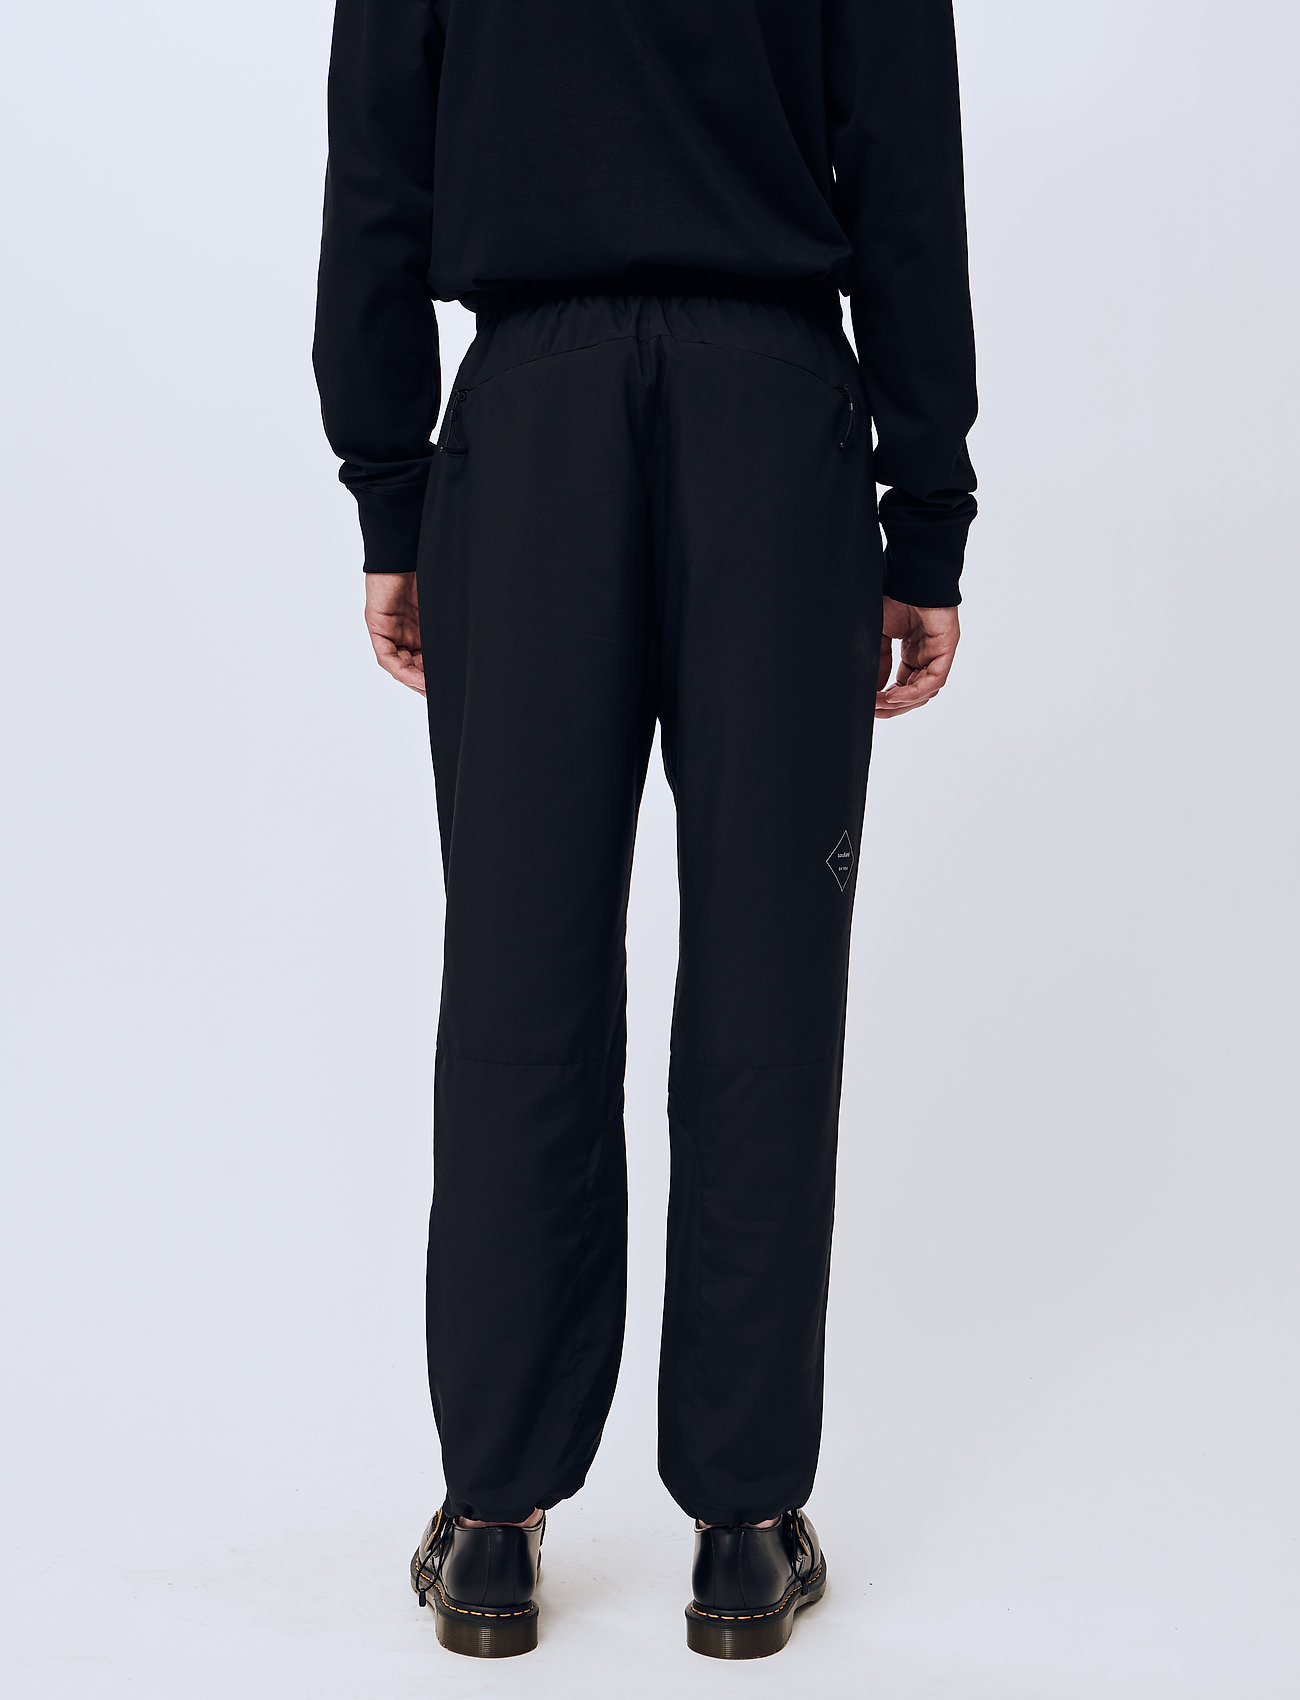 Soulland - Frey pants - spodnie na co dzień - black - 3